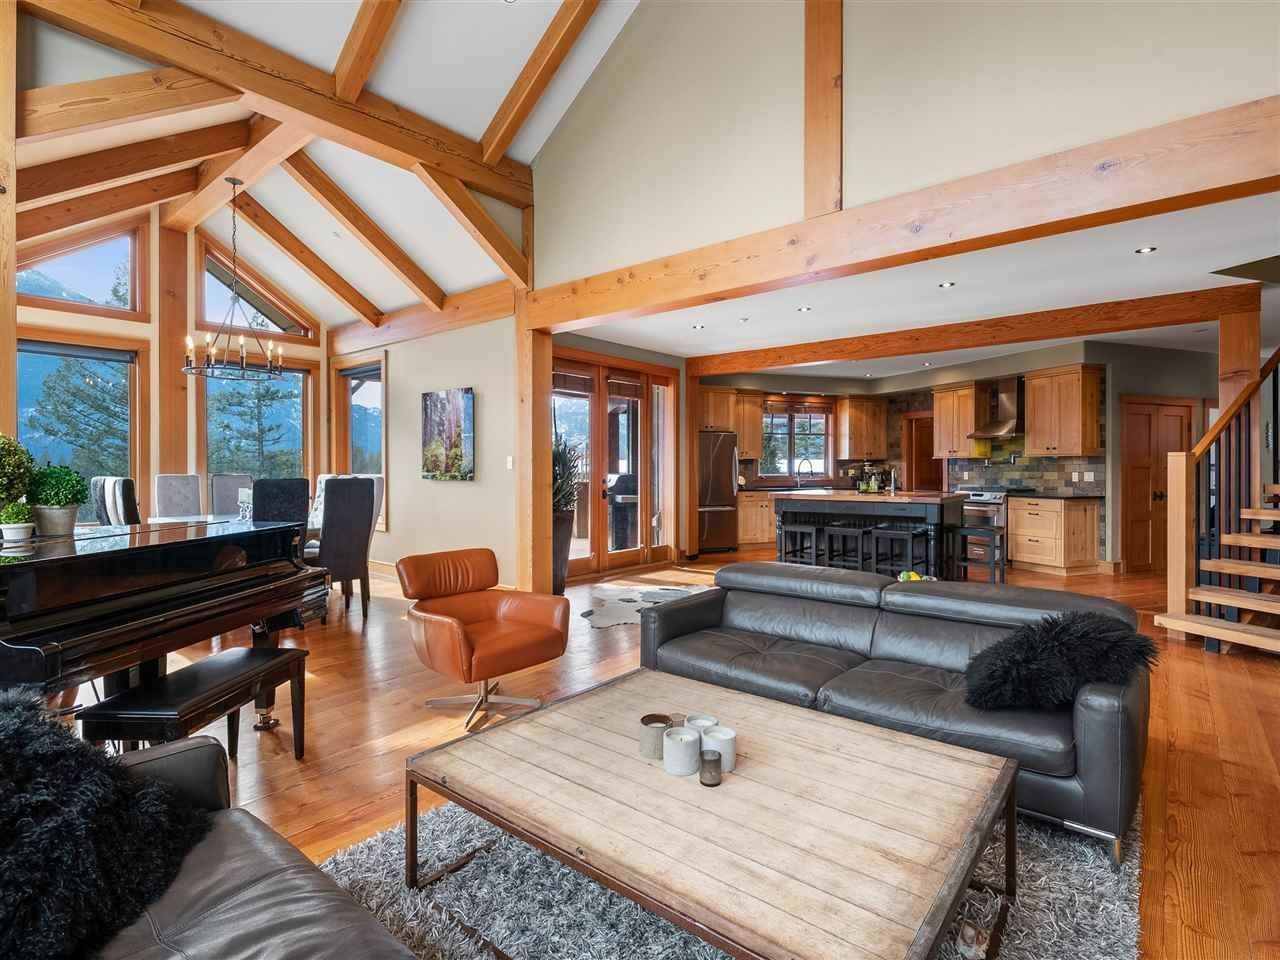 Photo 12: Photos: 1766 PINEWOOD DRIVE: Pemberton House for sale : MLS®# R2543608